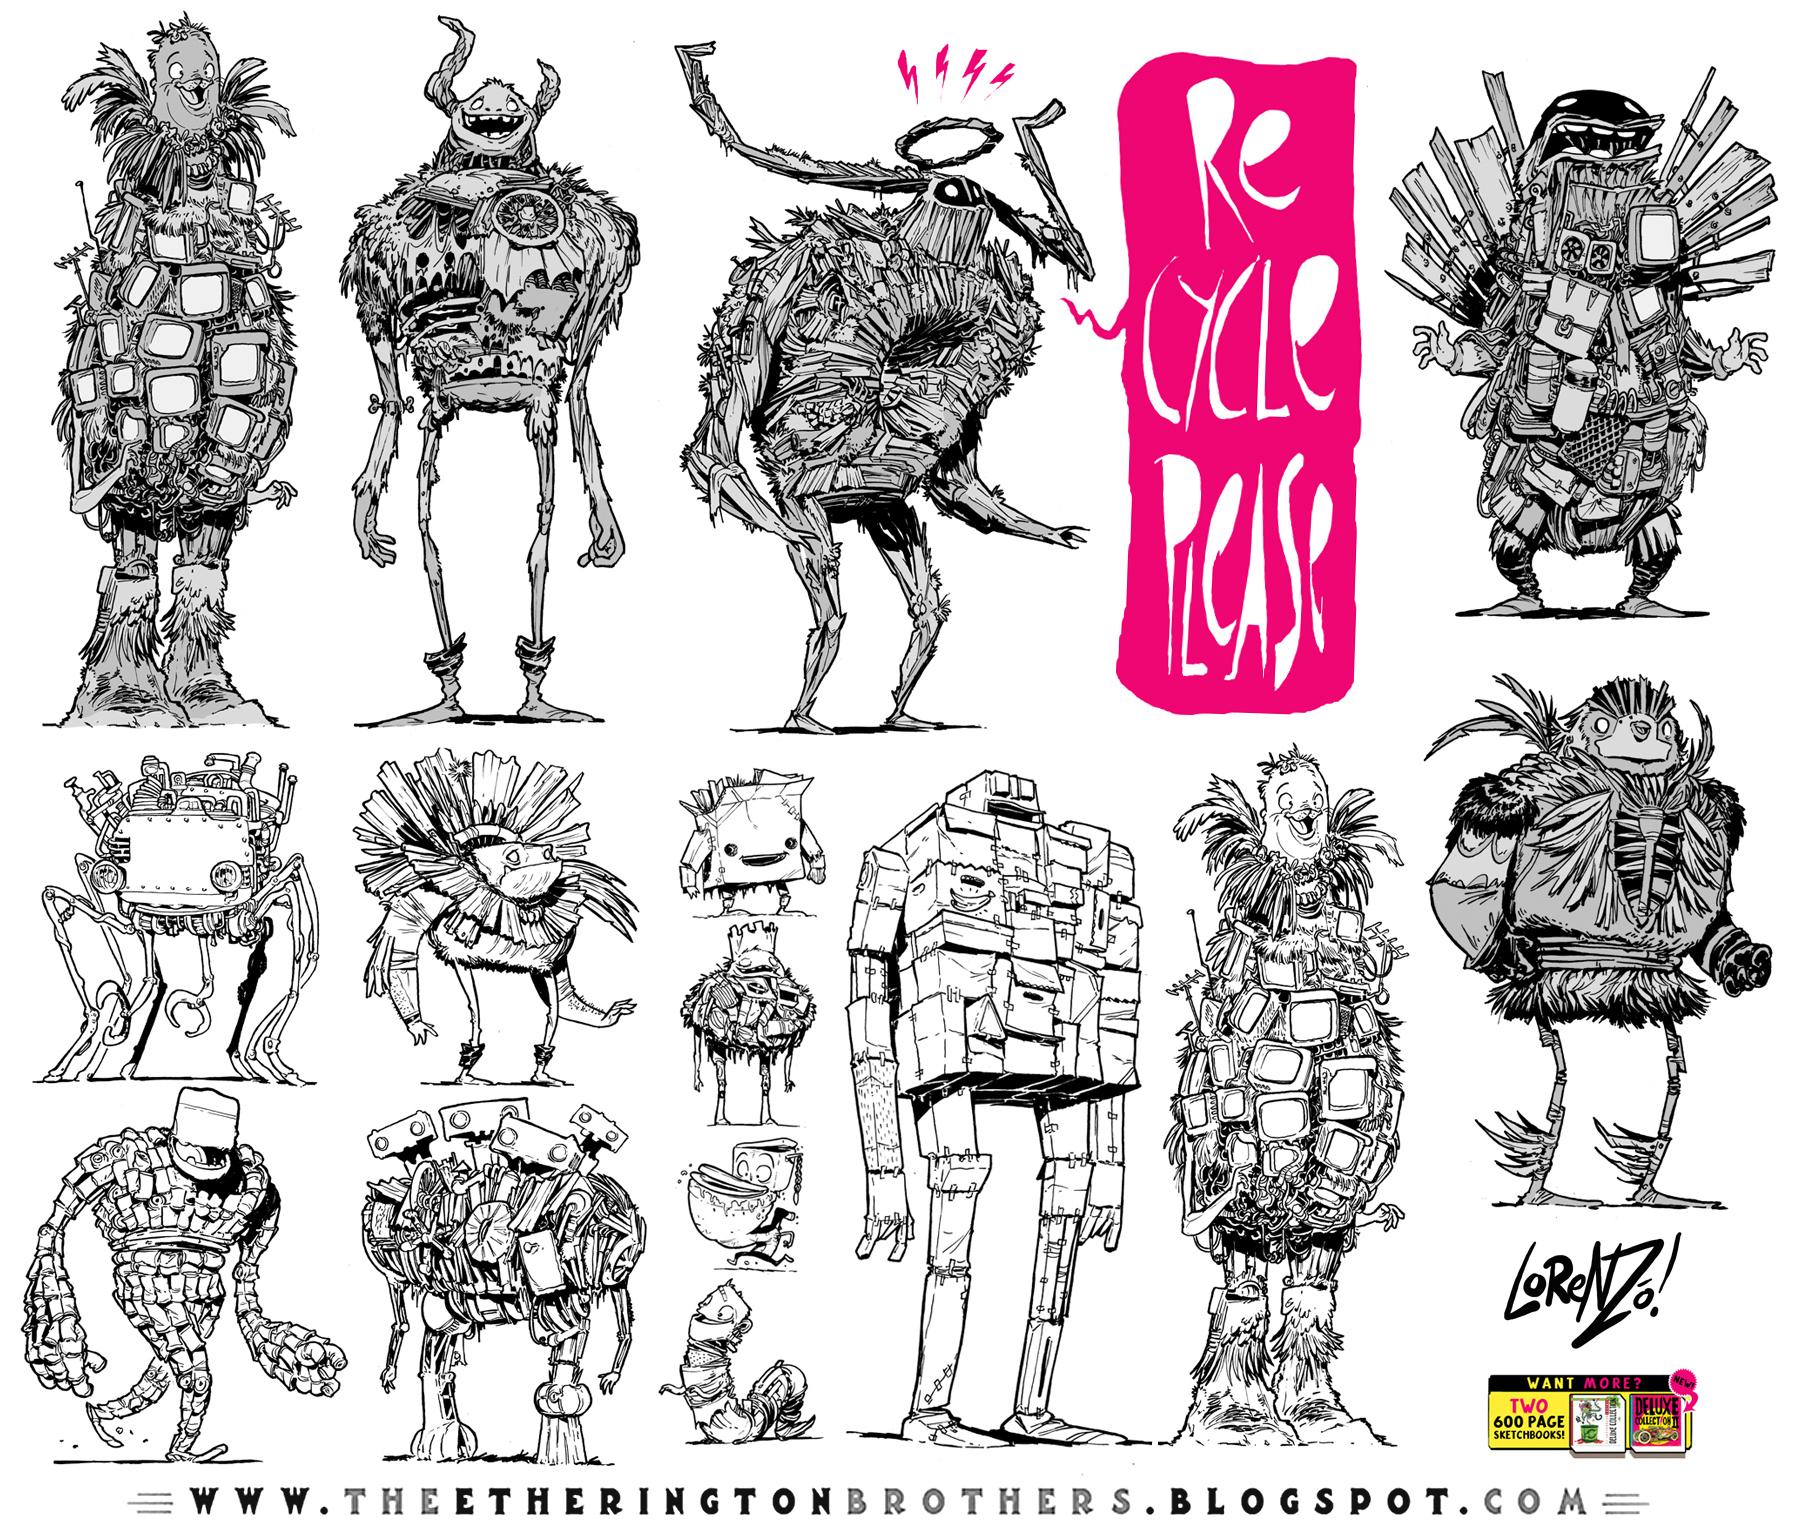 12 Junk and Trash Monster Robot Design Concepts by EtheringtonBrothers